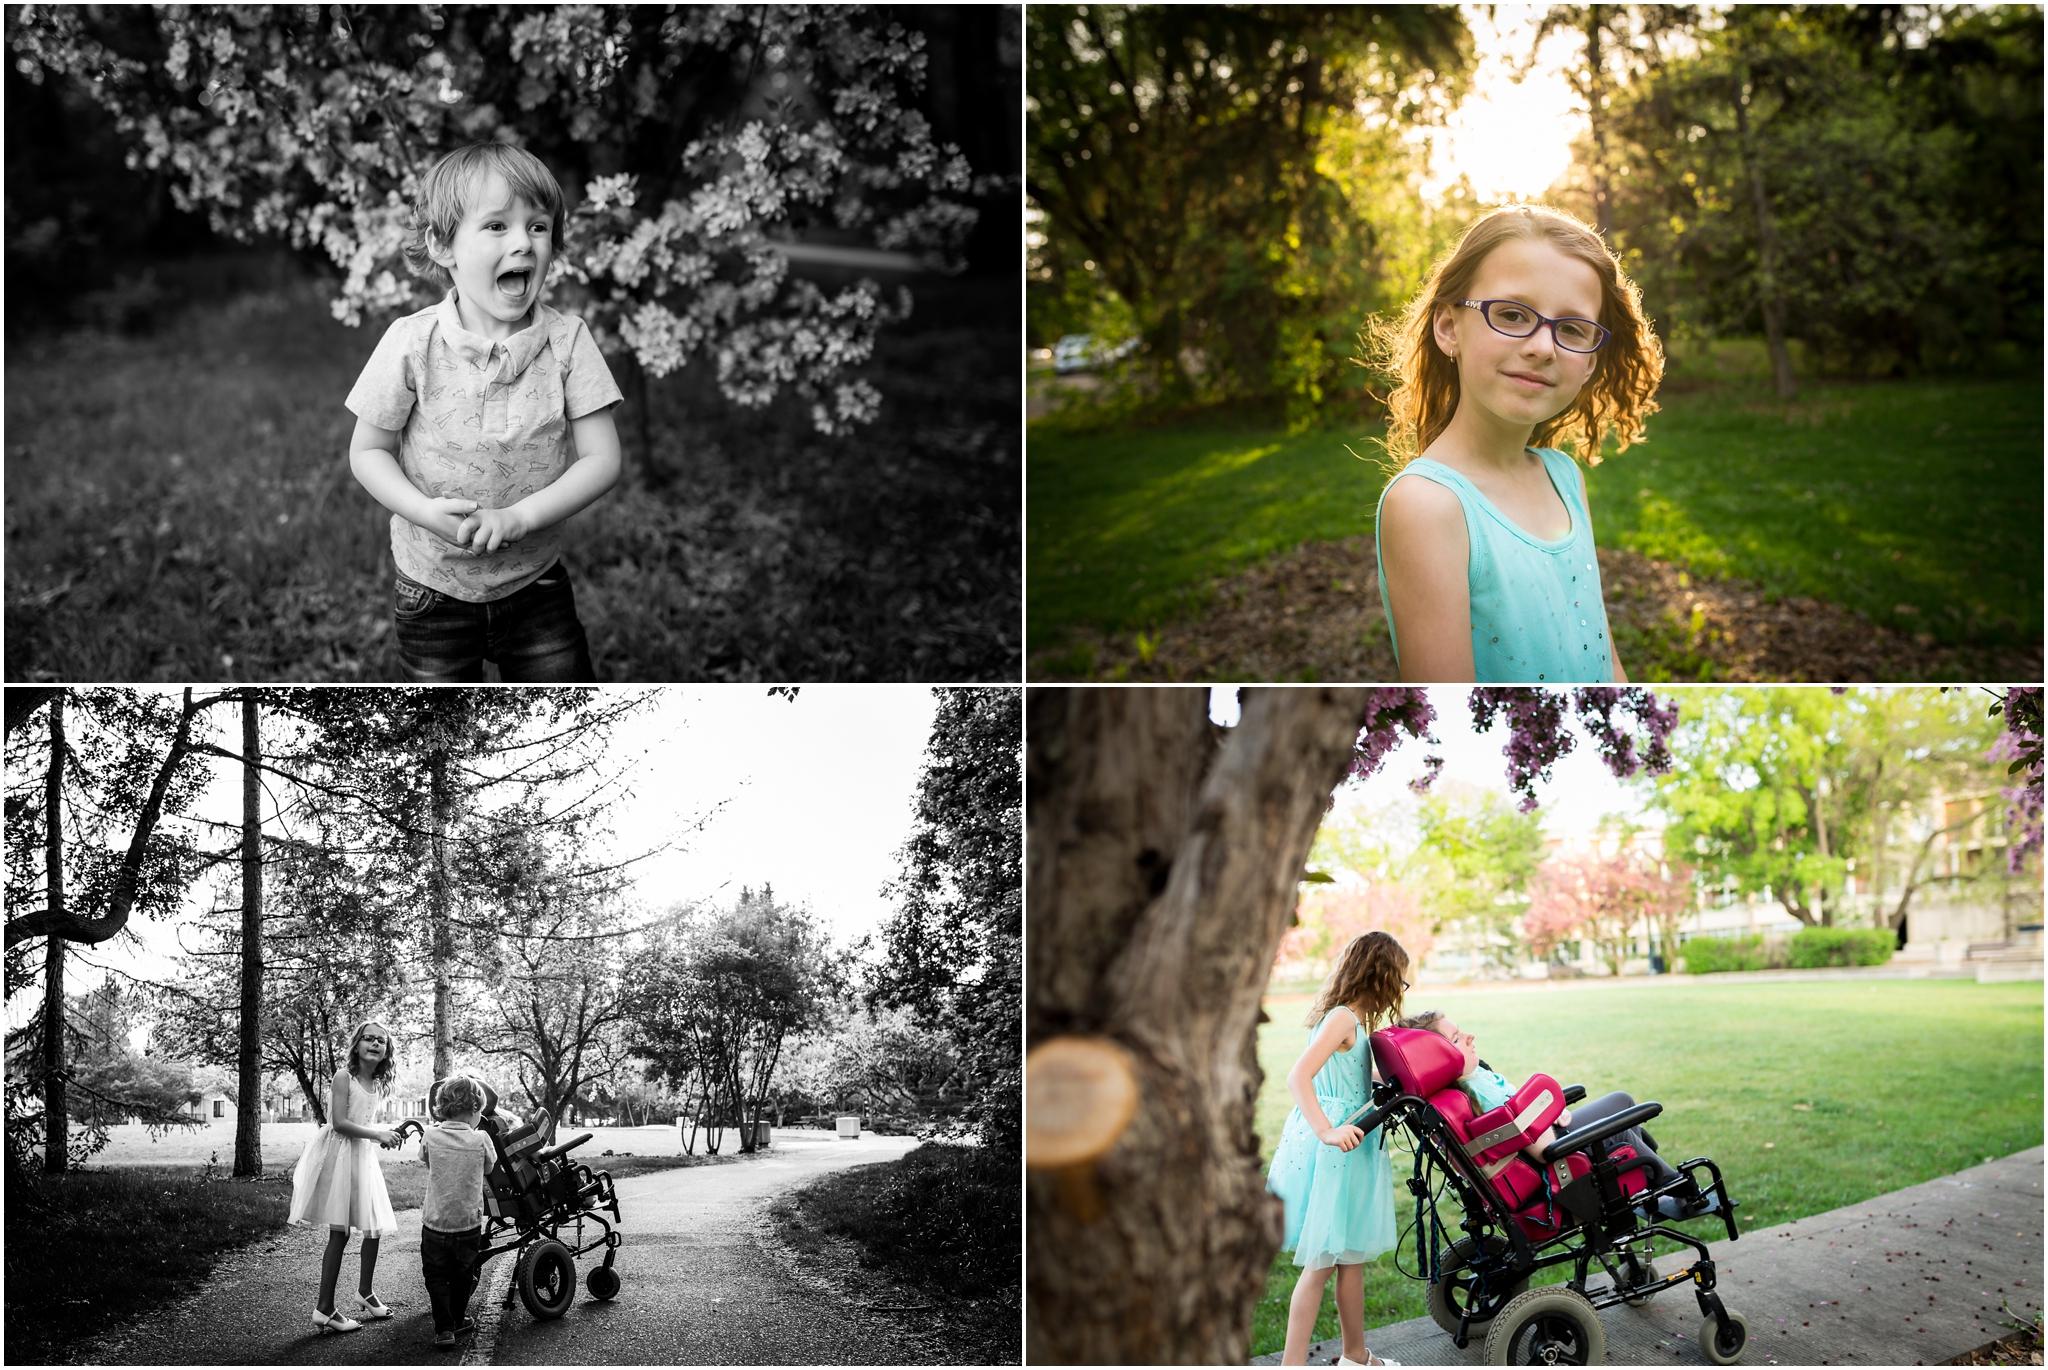 Edmonton family photographer cherry blossom best of 2016 may